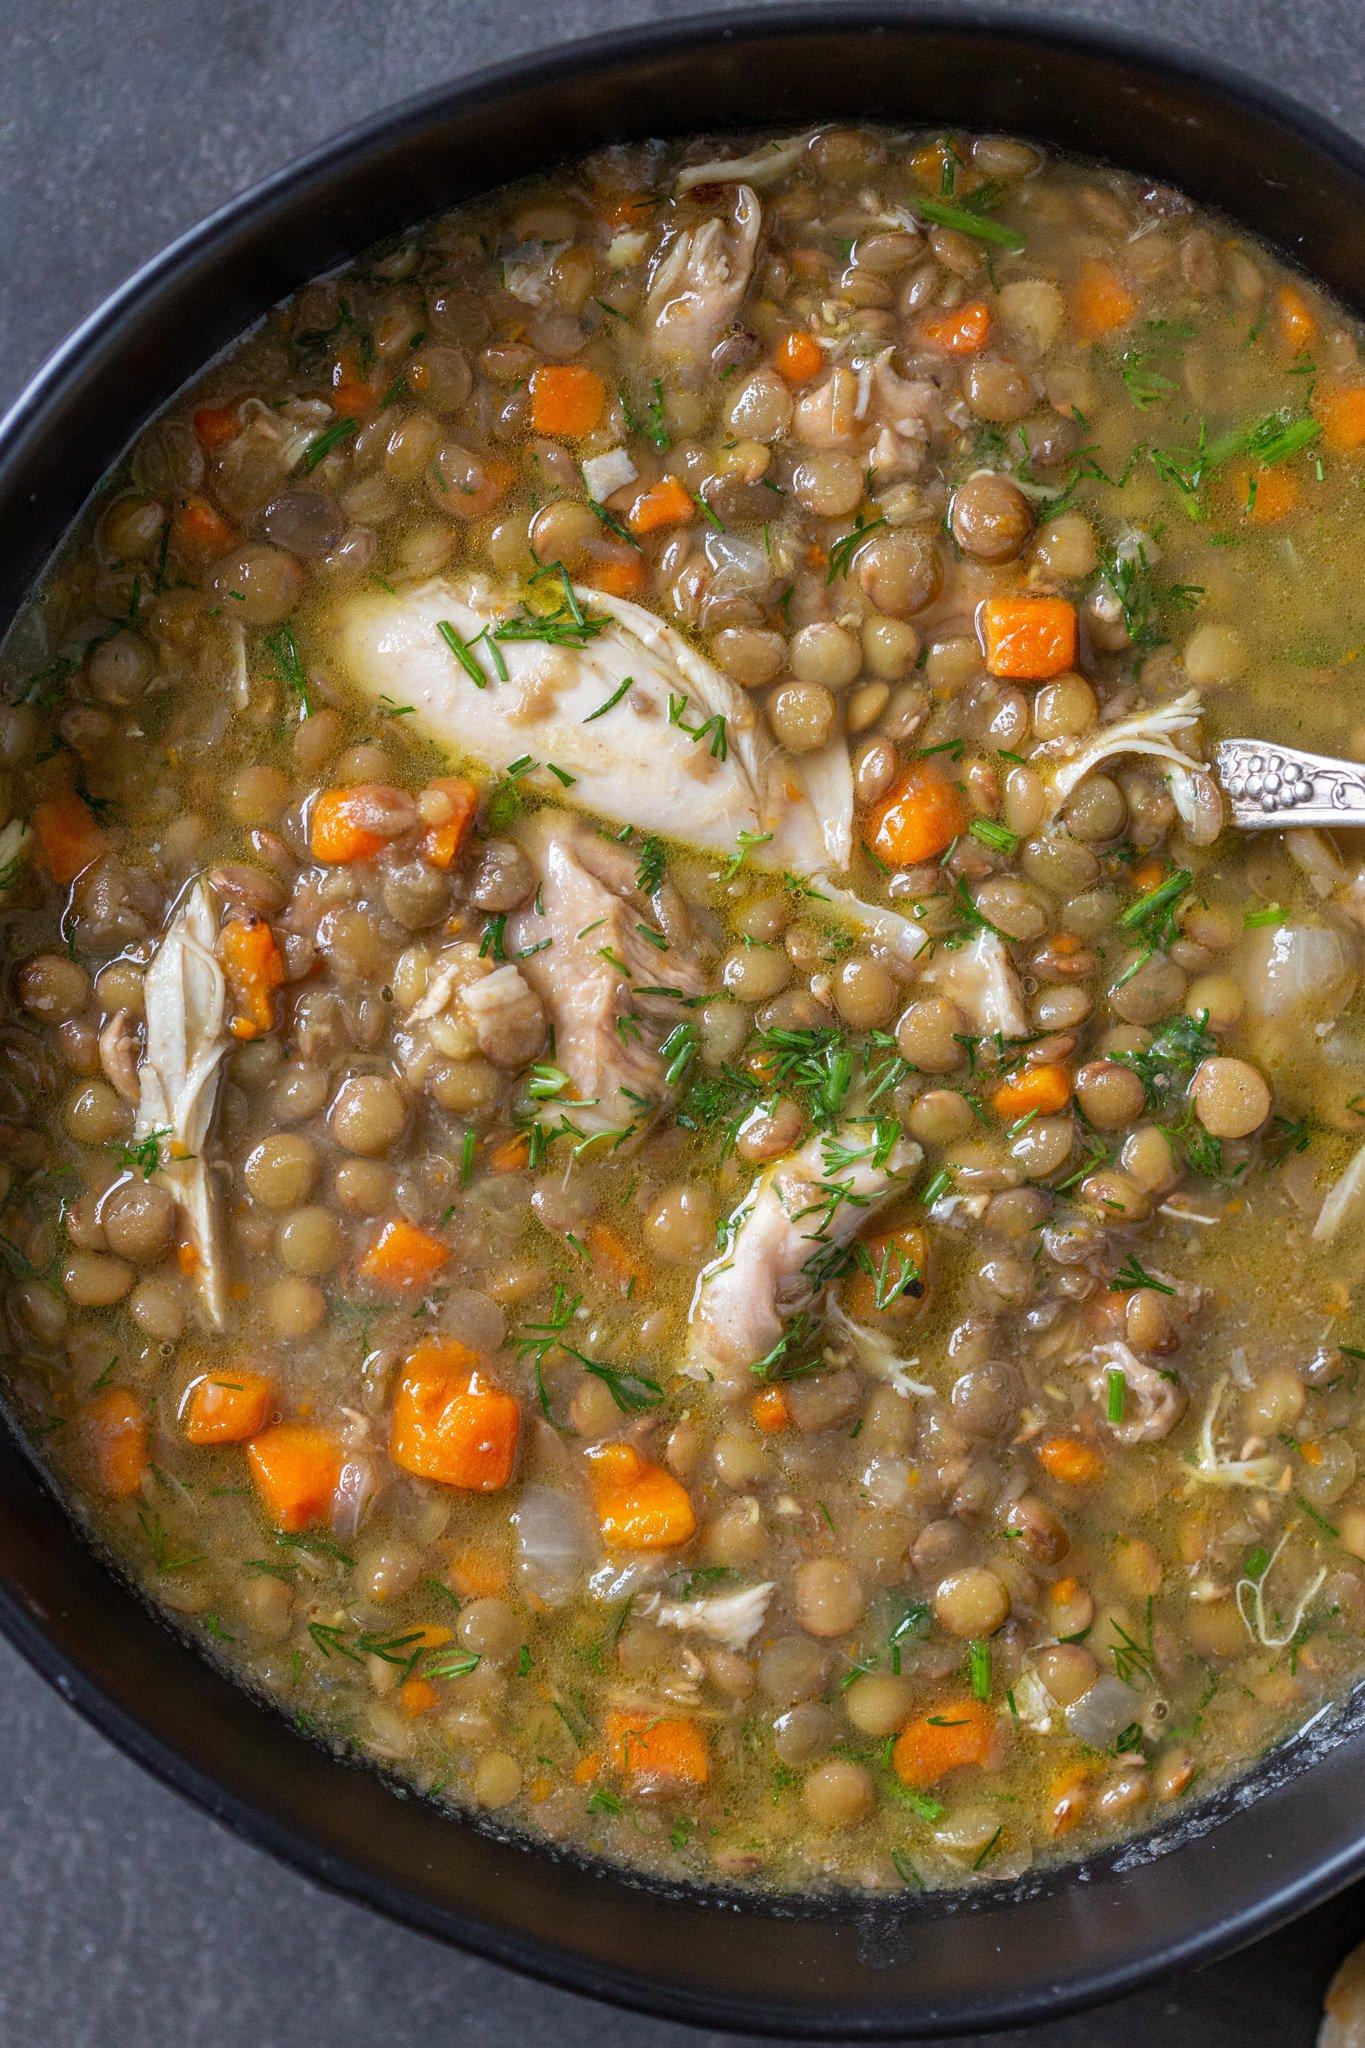 Lentil chicken soup in a bowl